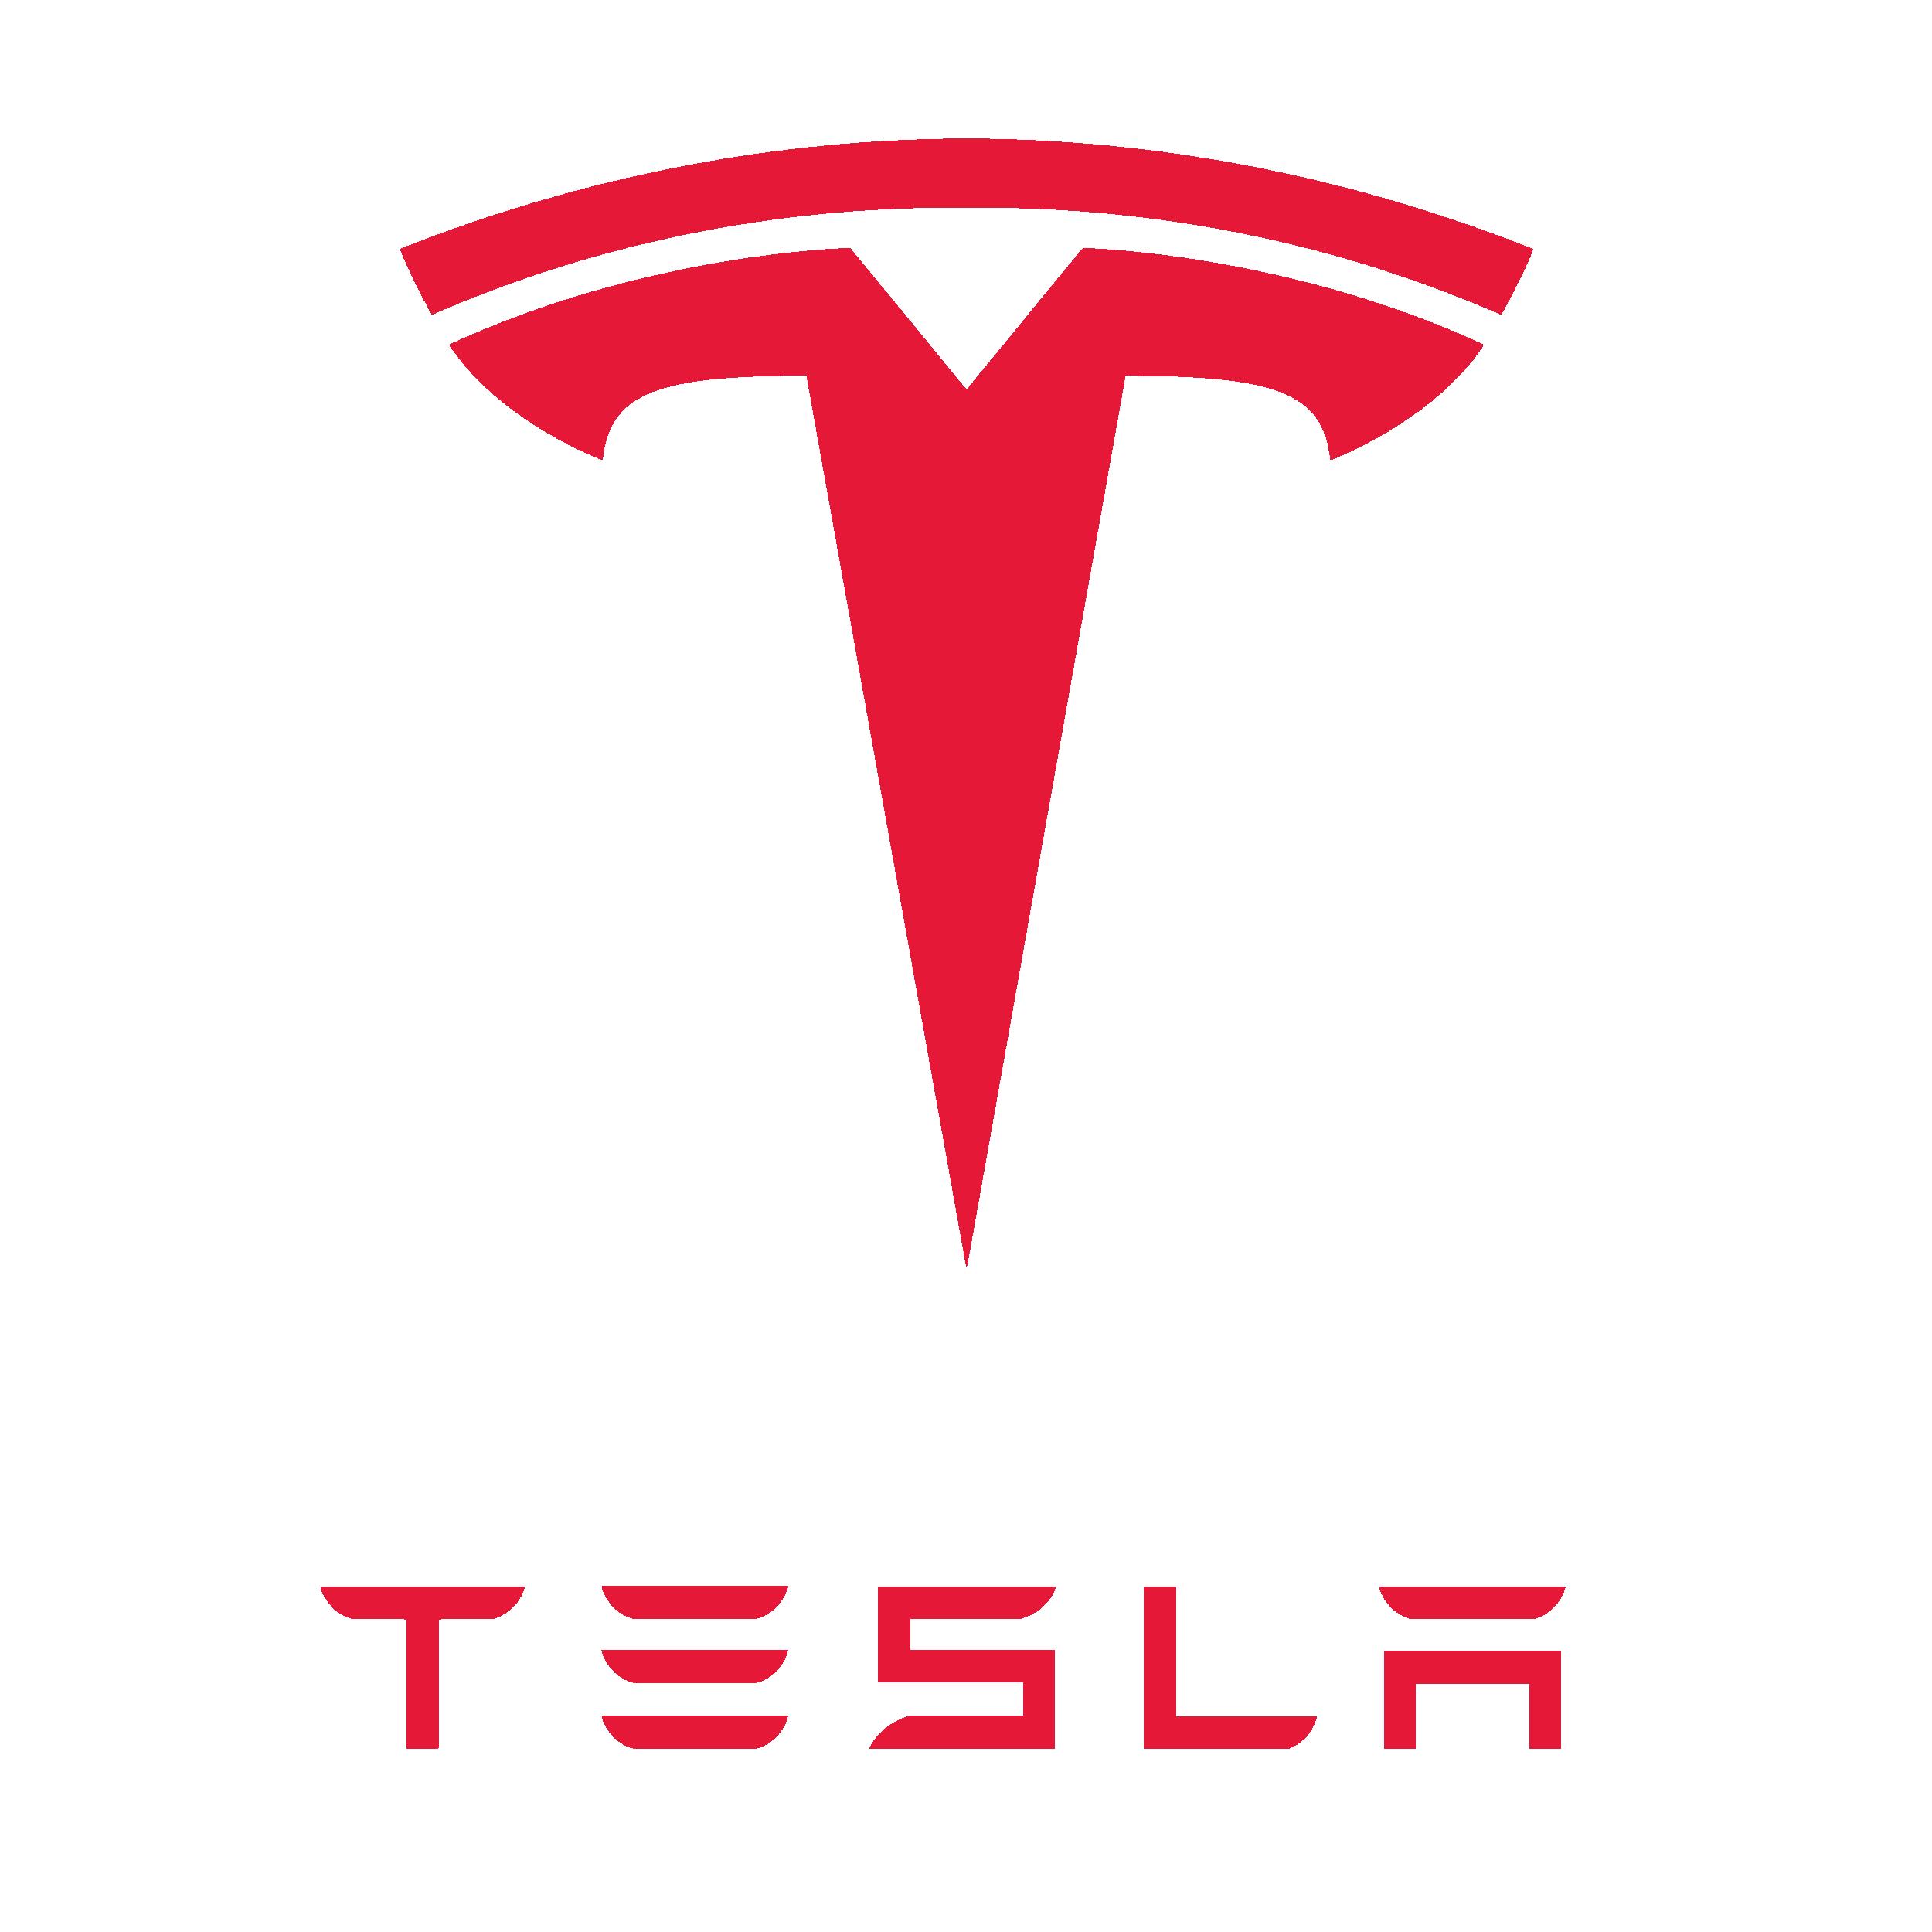 Tesla Logo (2003-Present) 2500x2500 HD png - Tesla PNG